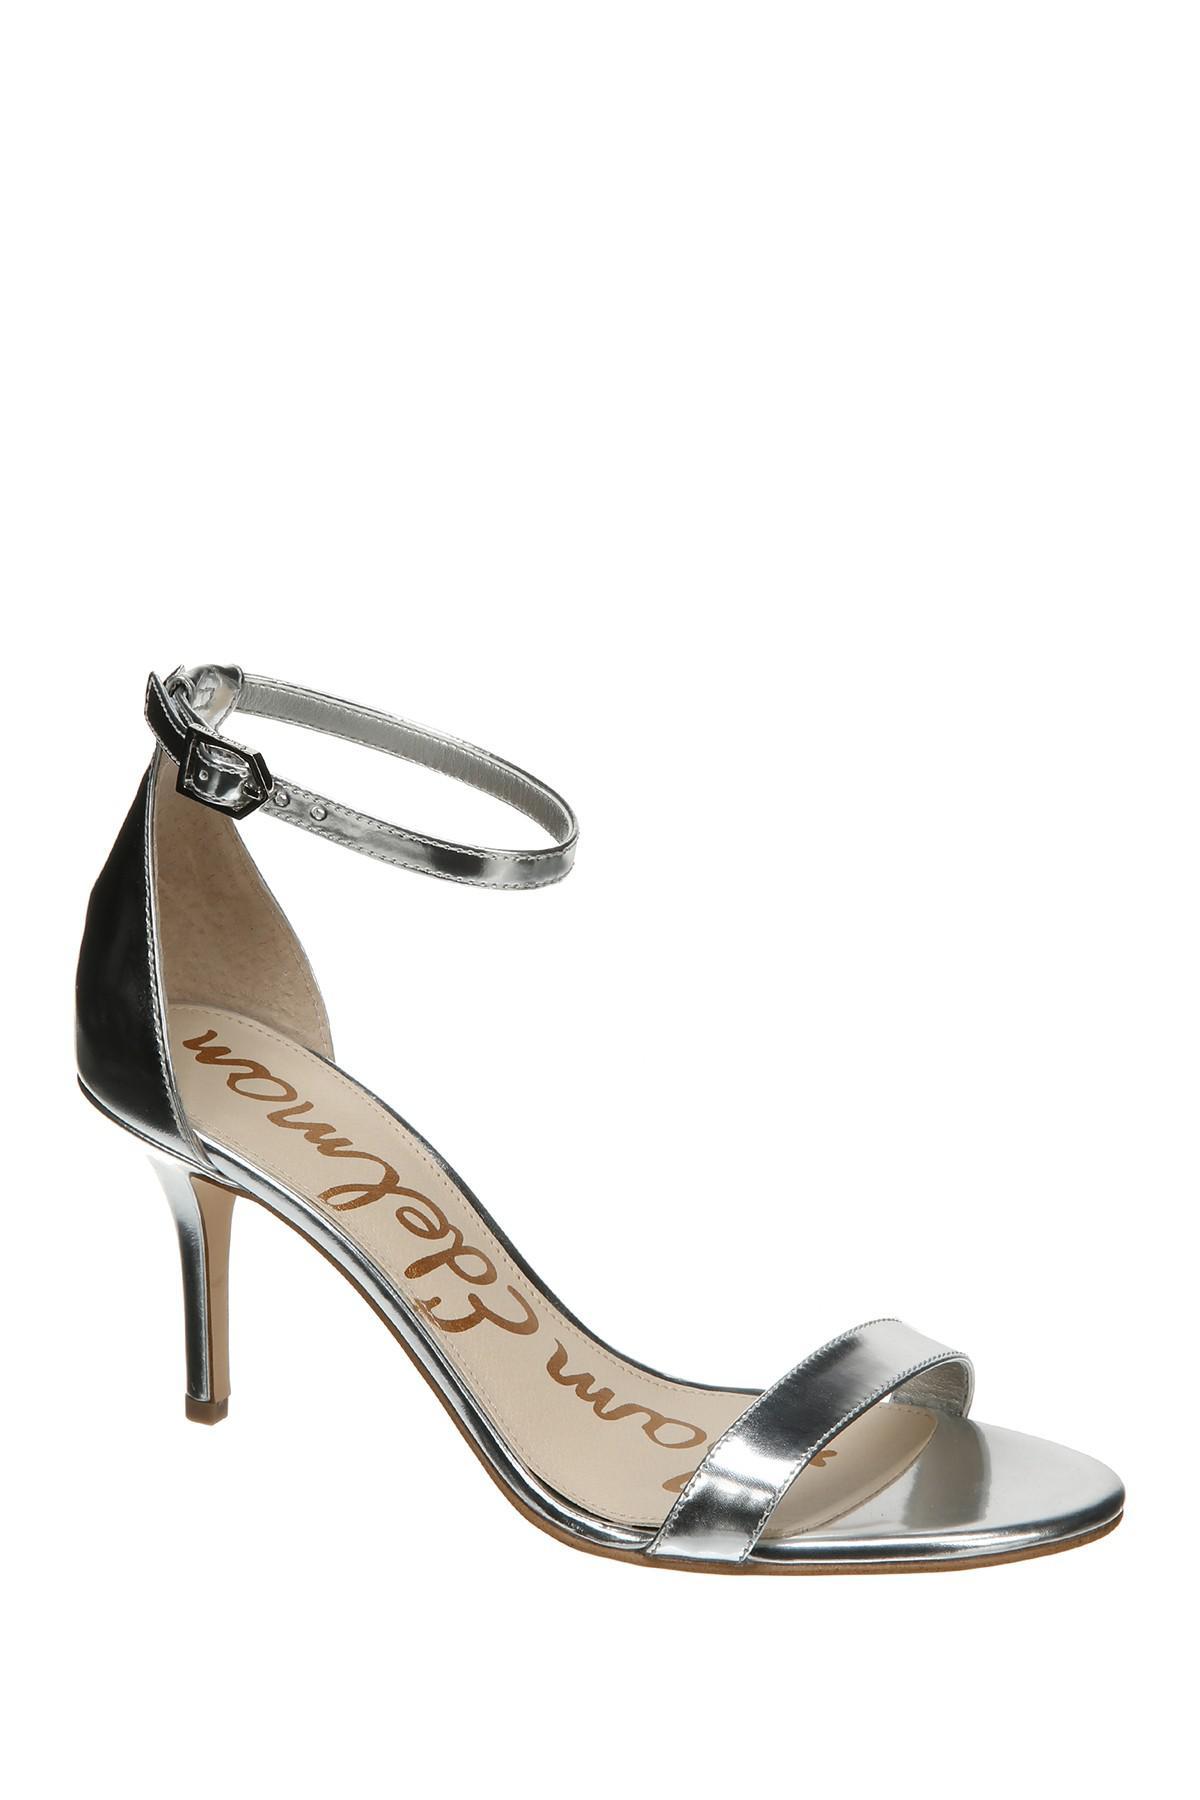 8126548d940 Lyst - Sam Edelman Patti Ankle Strap Sandal in Metallic